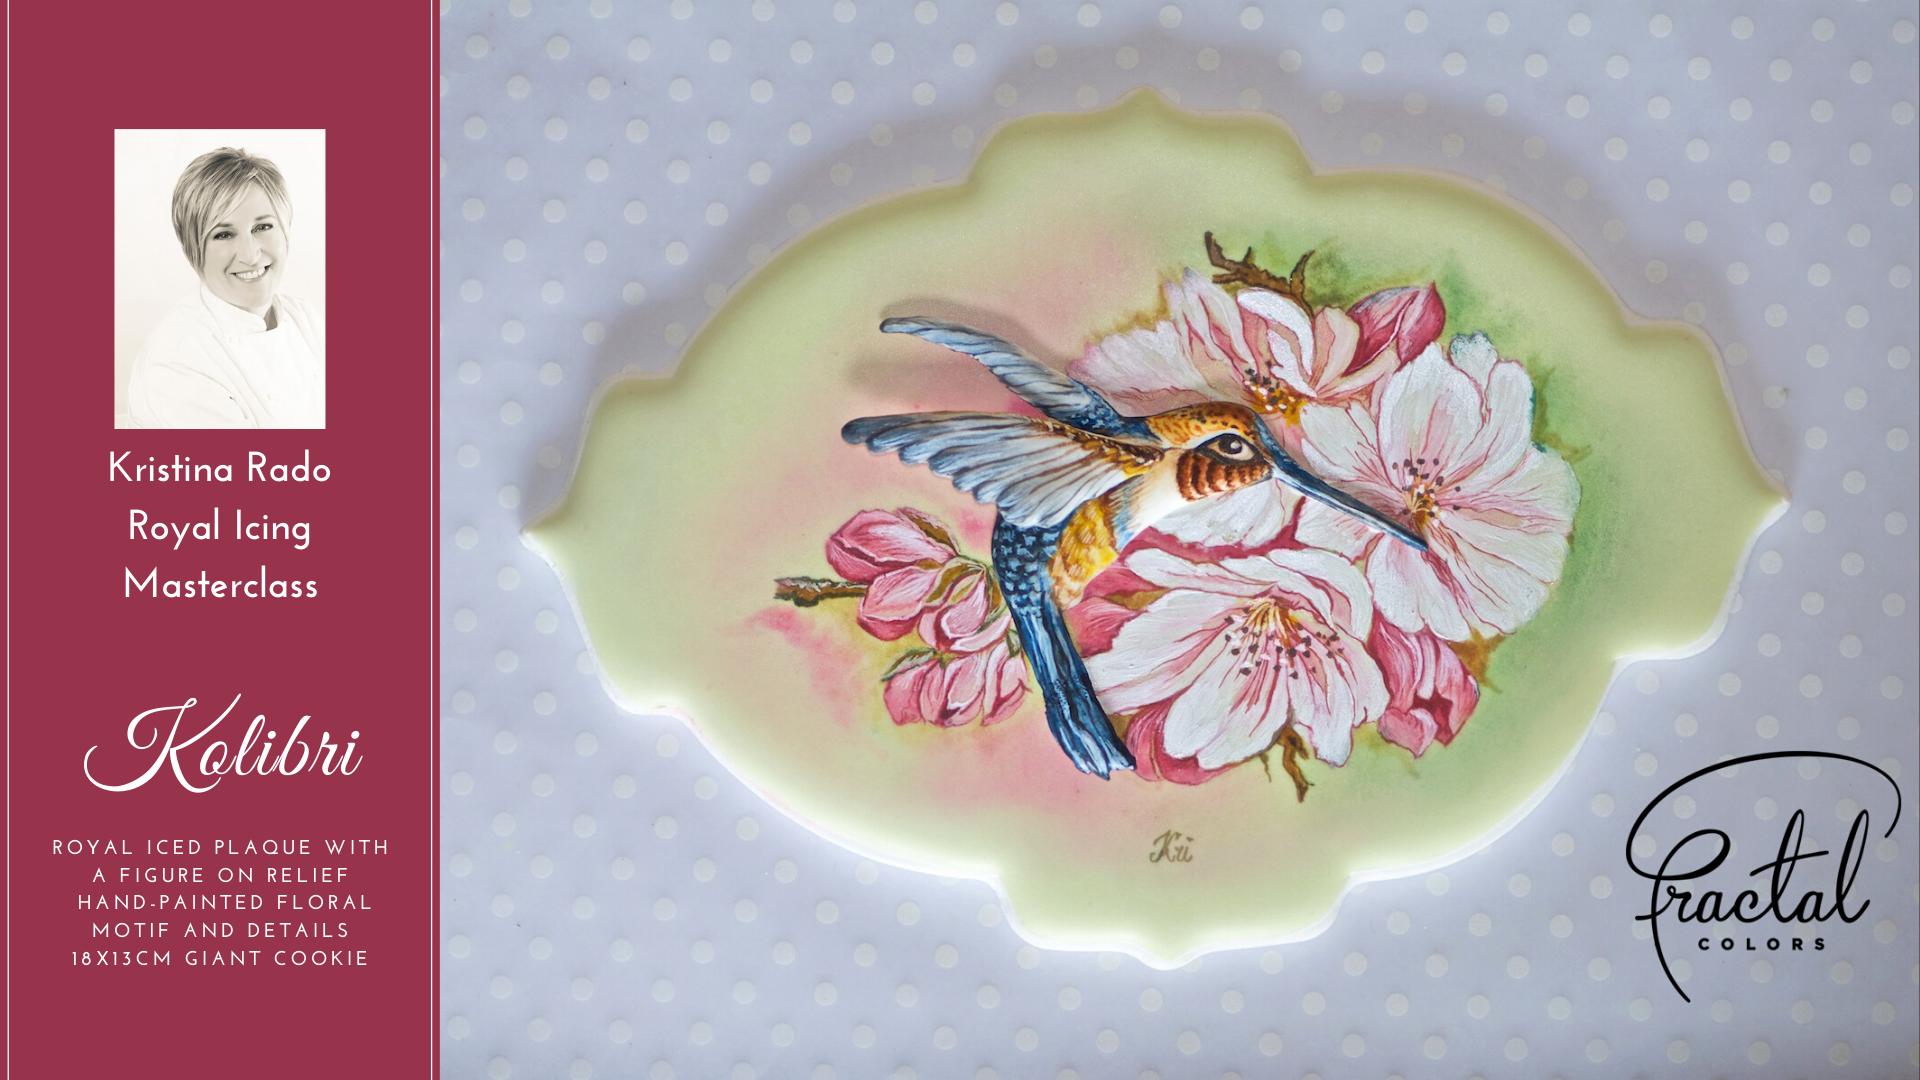 Kristina Rado Masterclass - Kolibri